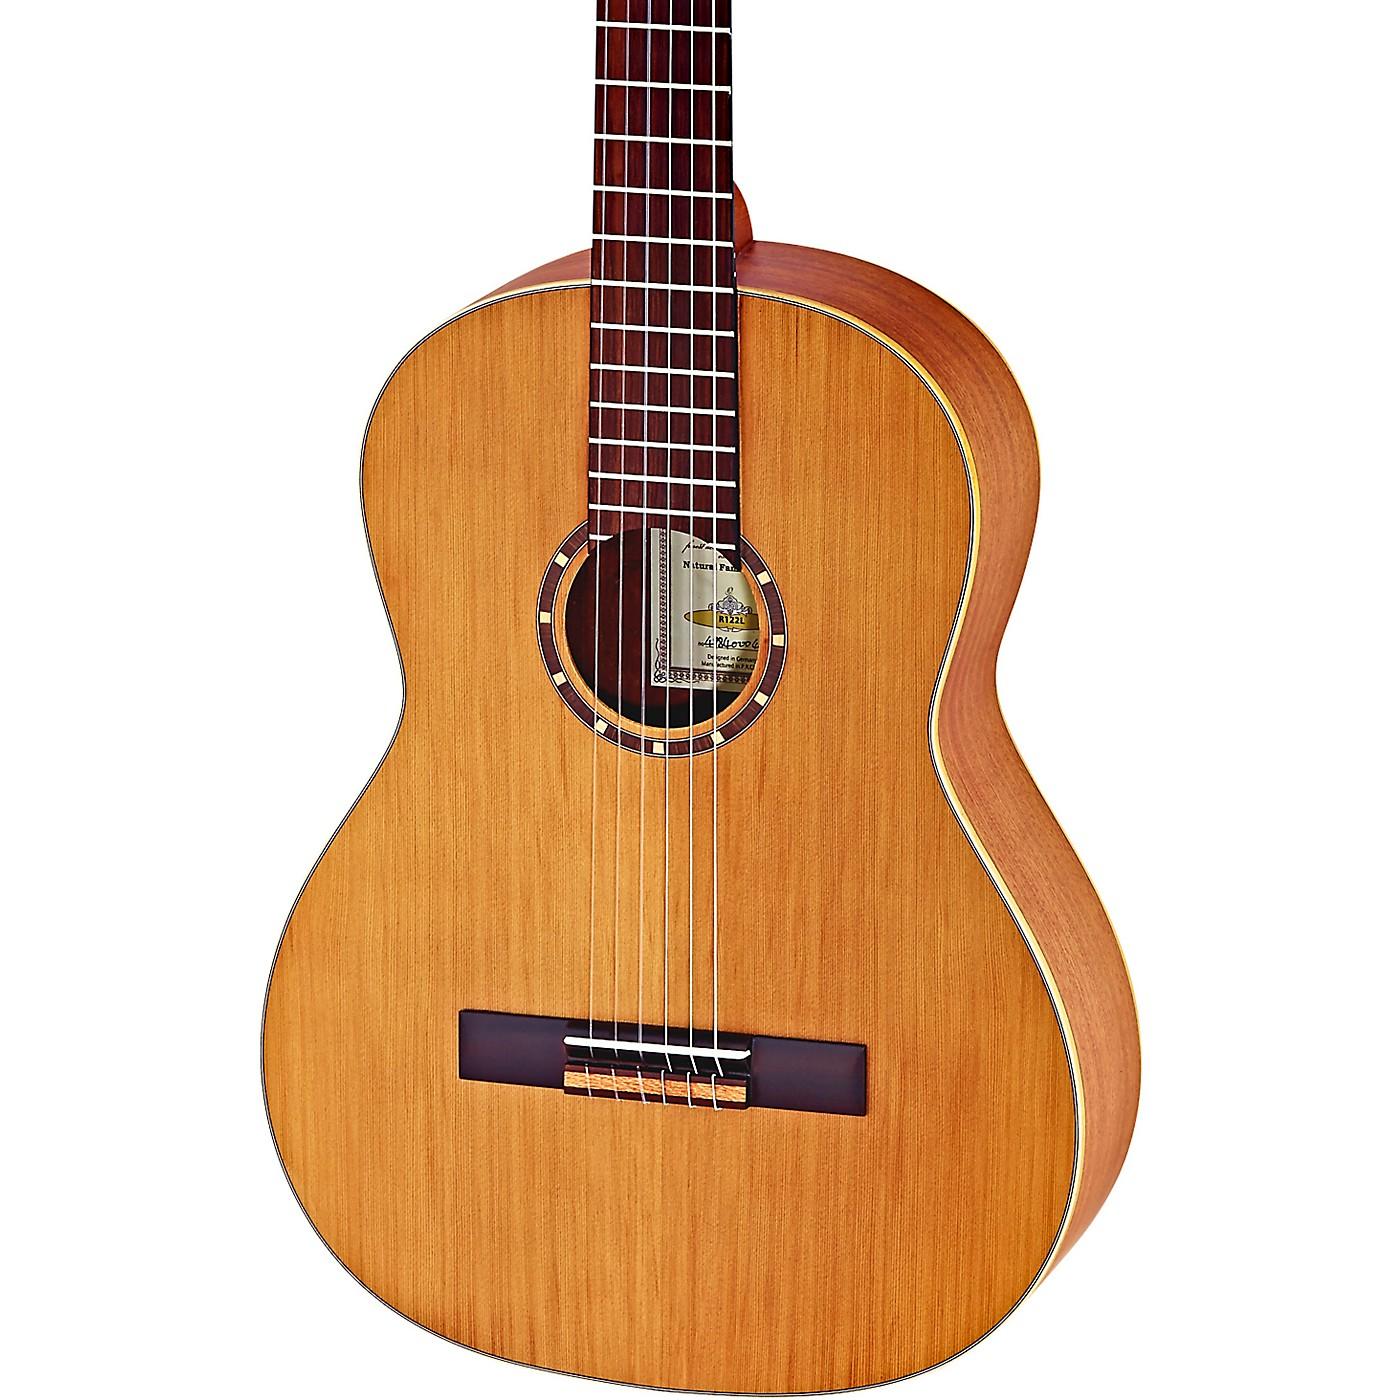 Ortega Family Series R122L Left-Handed Classical Guitar thumbnail